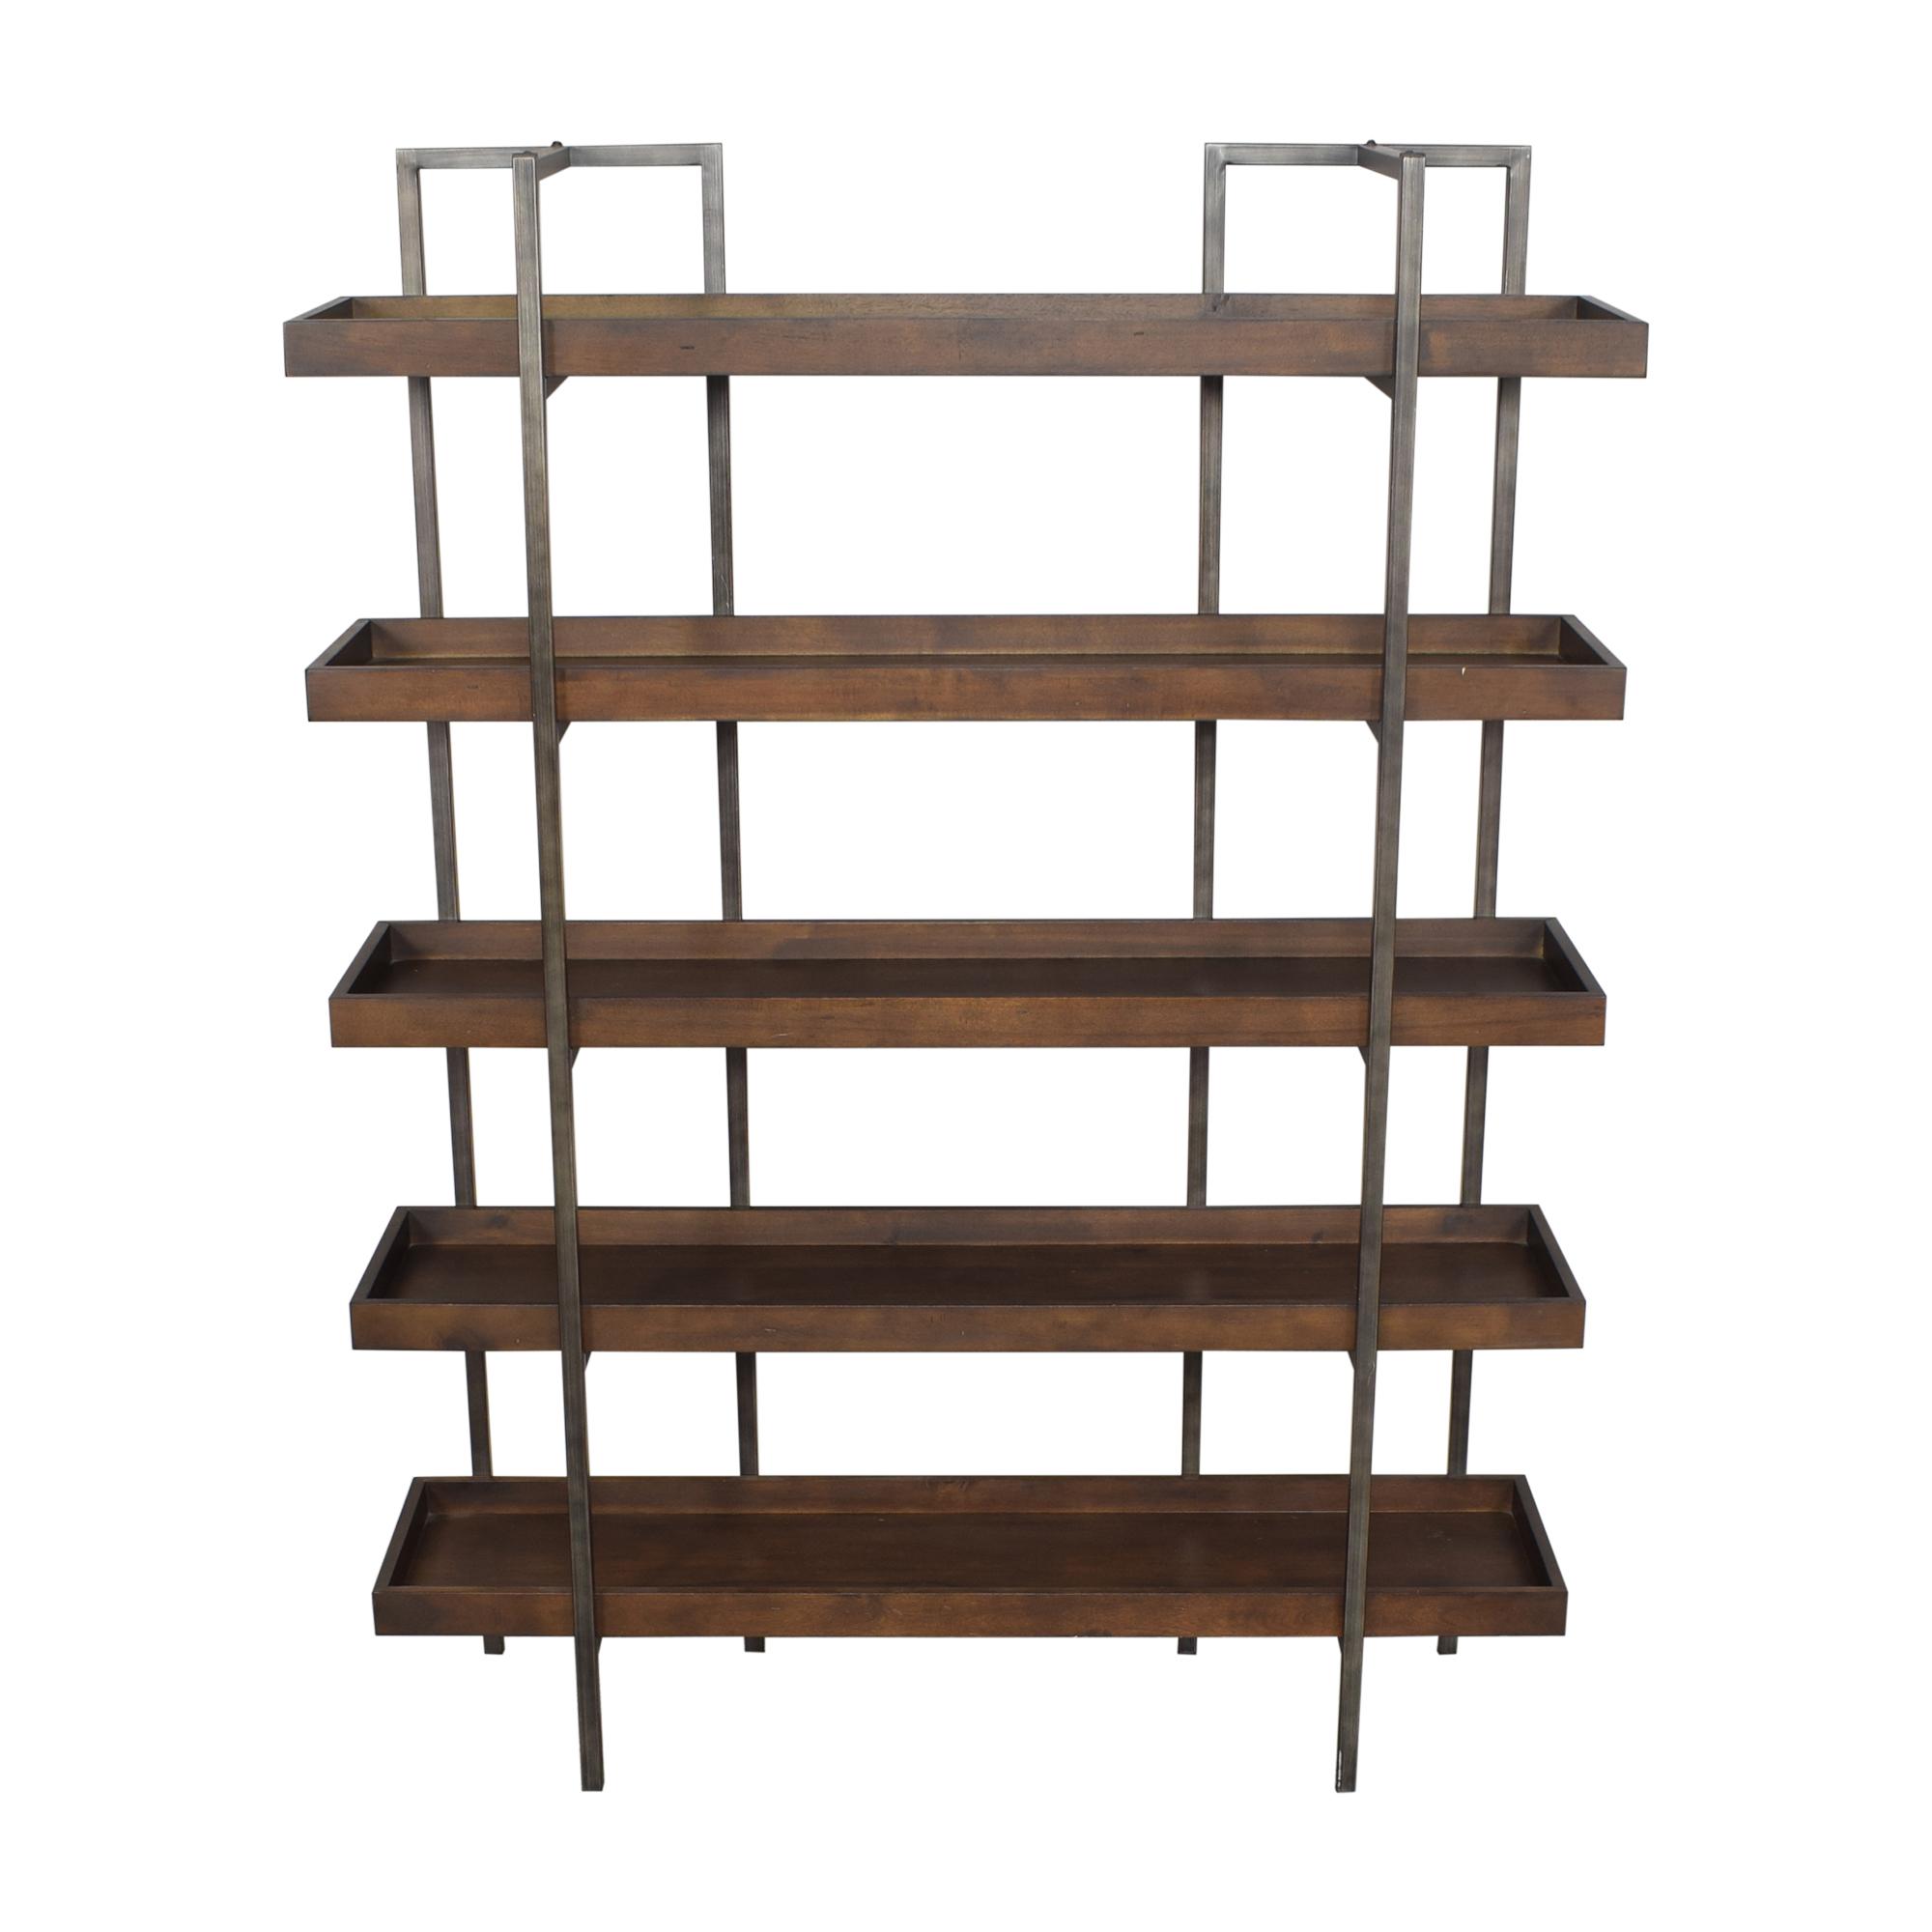 Ashley Furniture Starmore Bookcase / Bookcases & Shelving